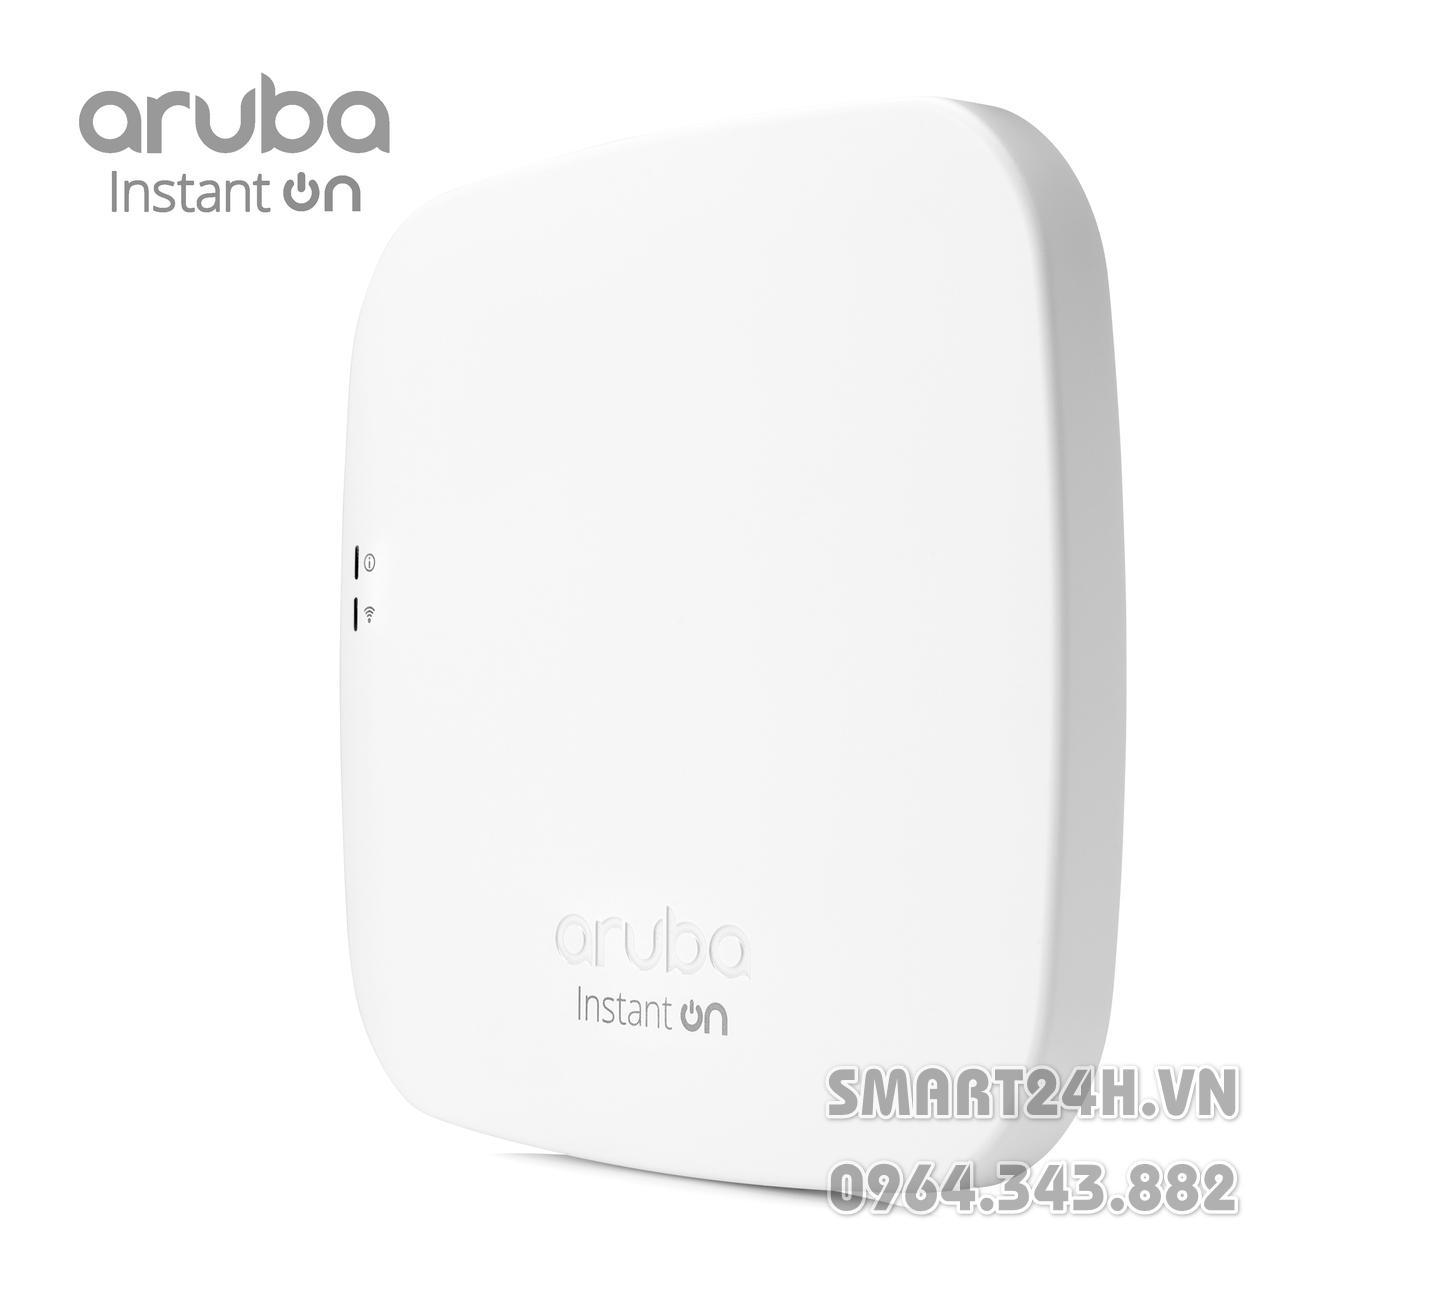 WiFi Aruba Instant On AP12